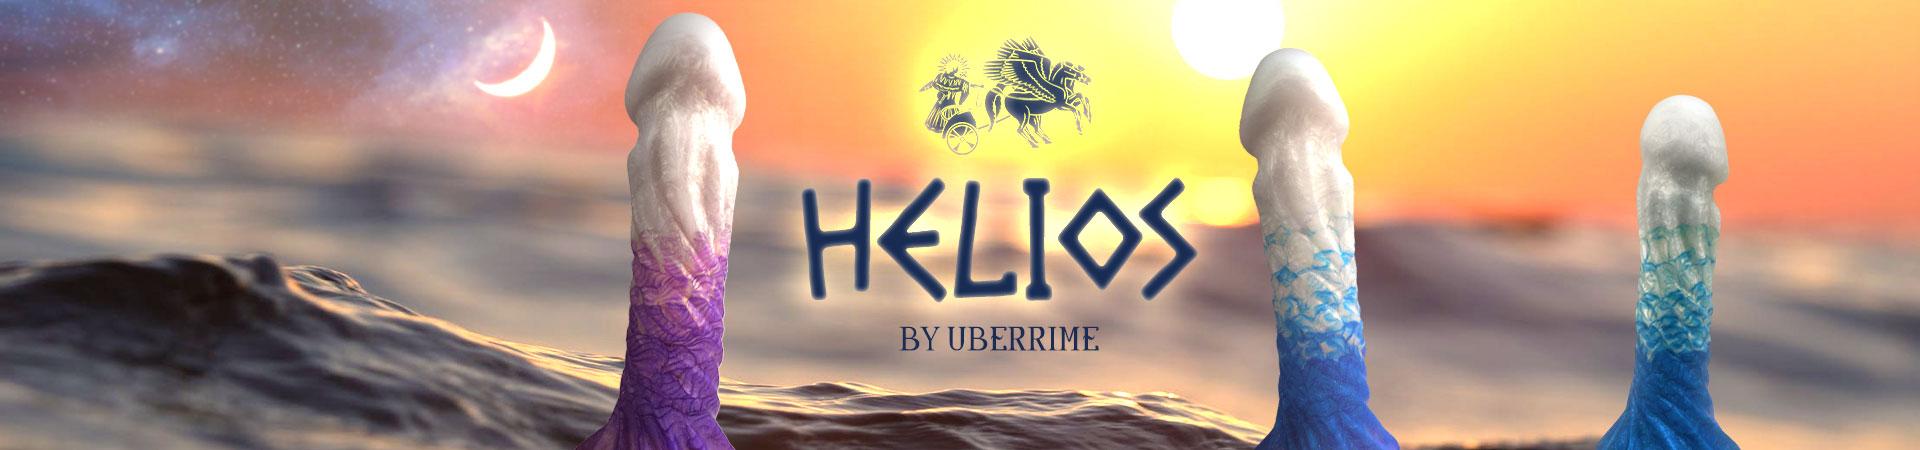 New Helios By Uberrime